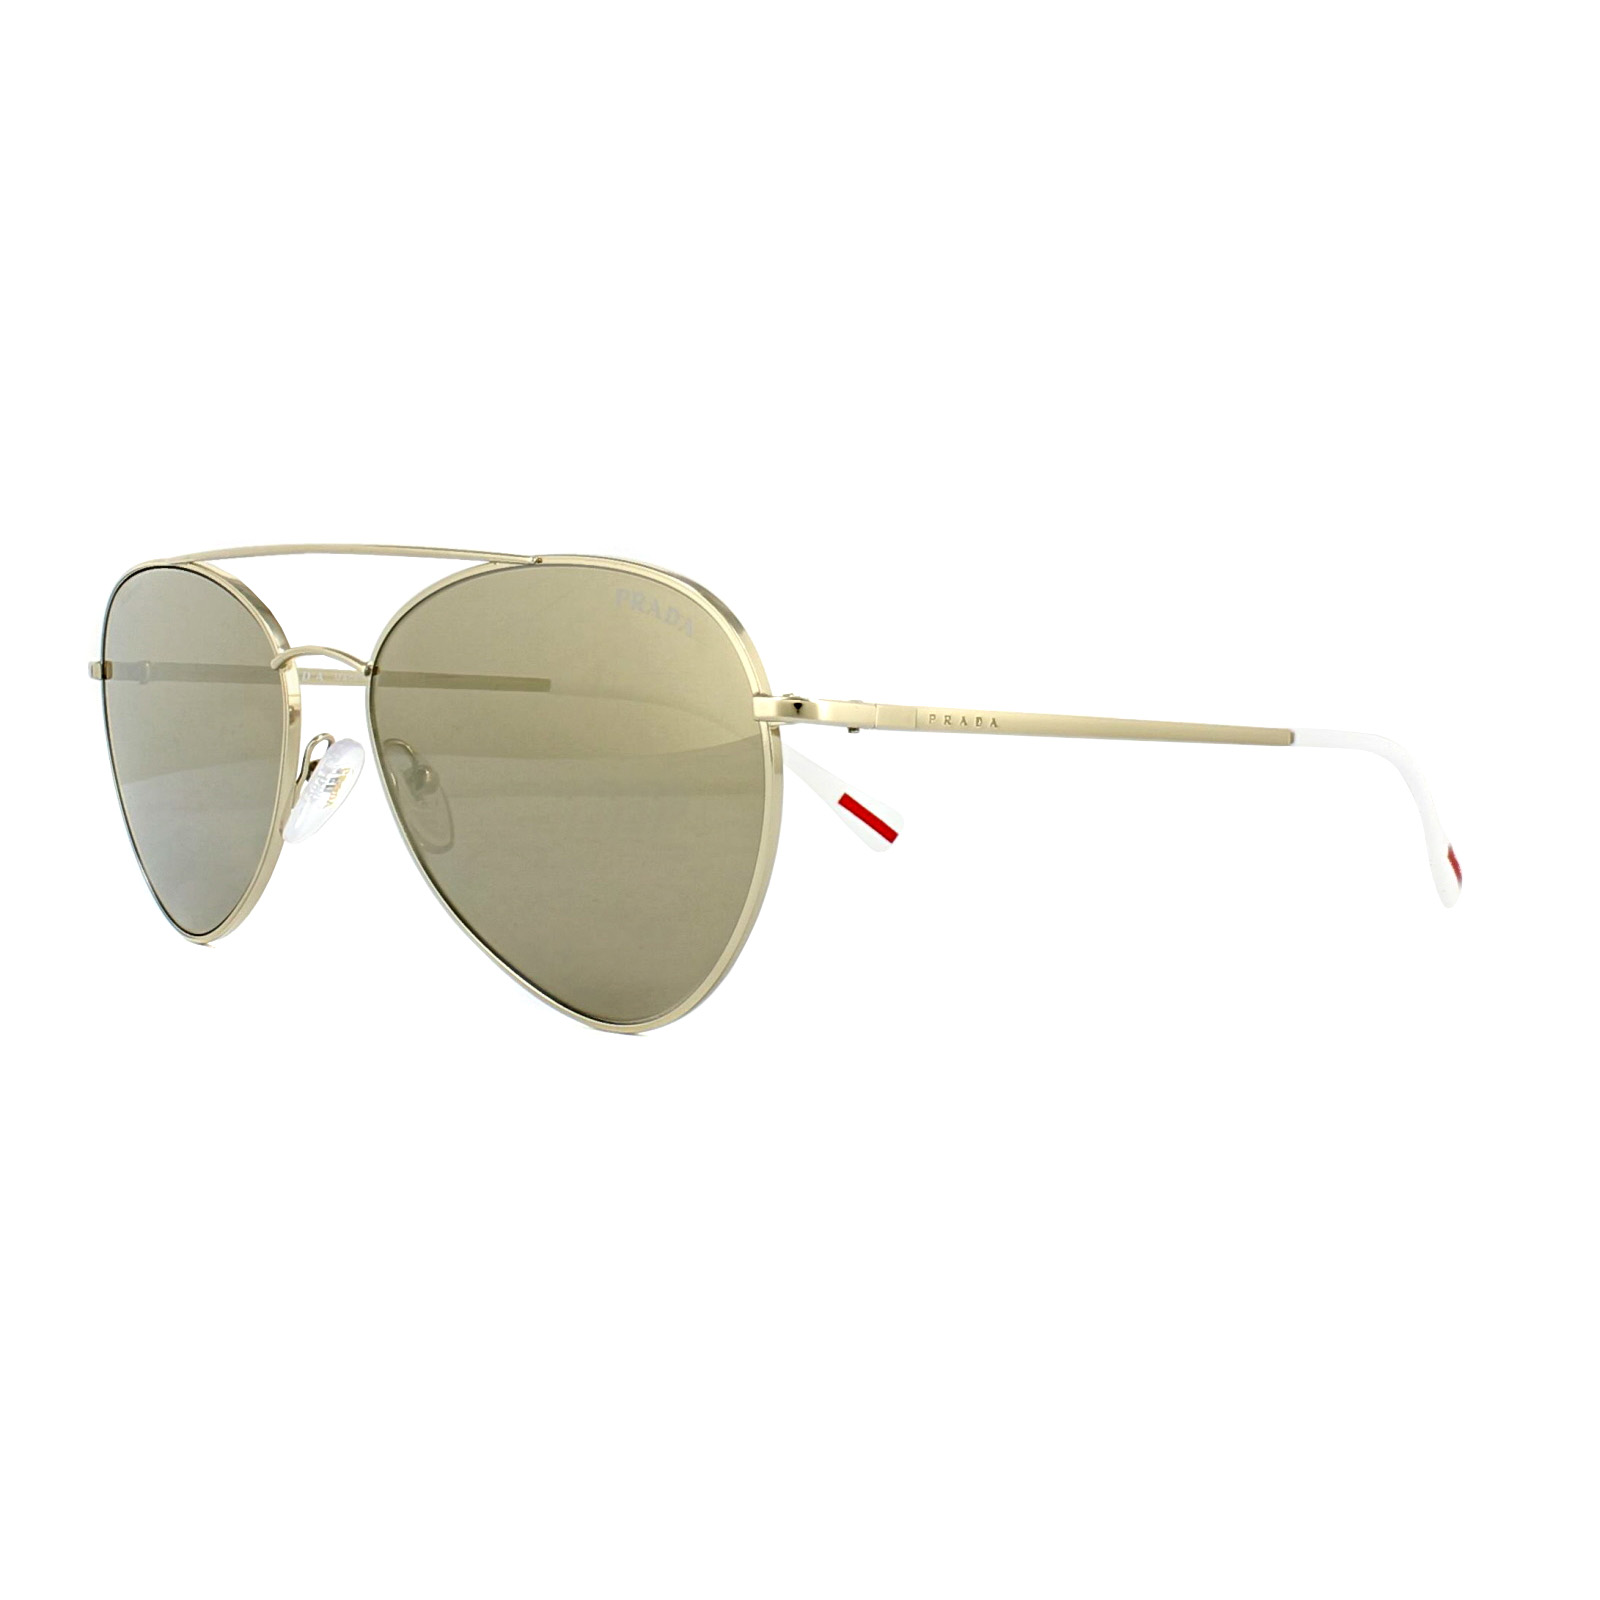 2c8ded51c328 Sentinel Prada Sport Sunglasses 50SS ZNV1C0 Pale Gold Brown Gold Mirror